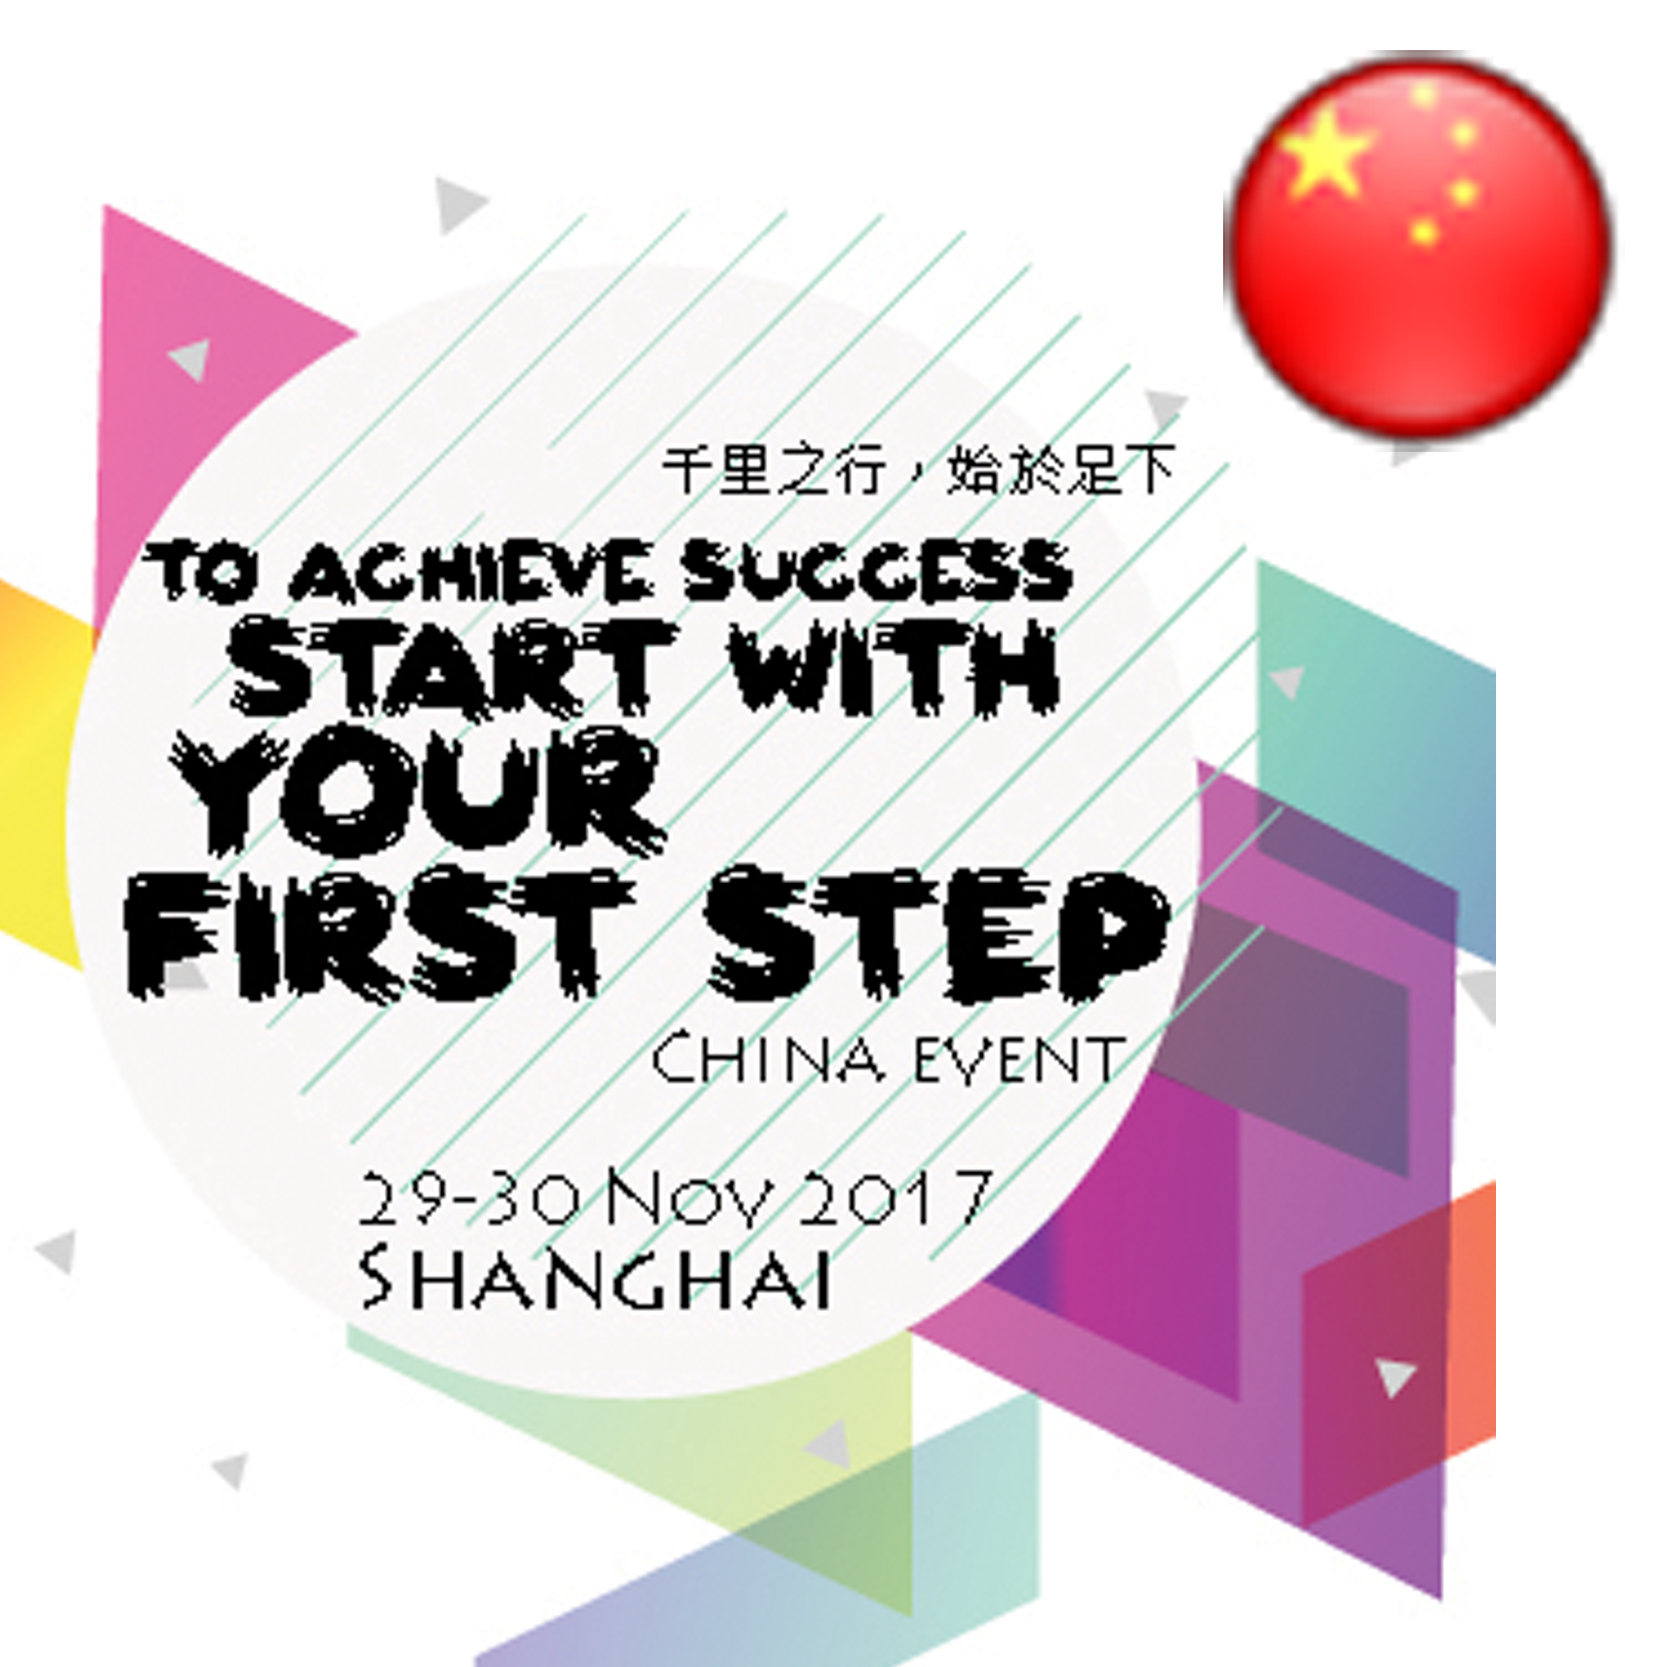 Nov 29-30 - China Shanghai Event